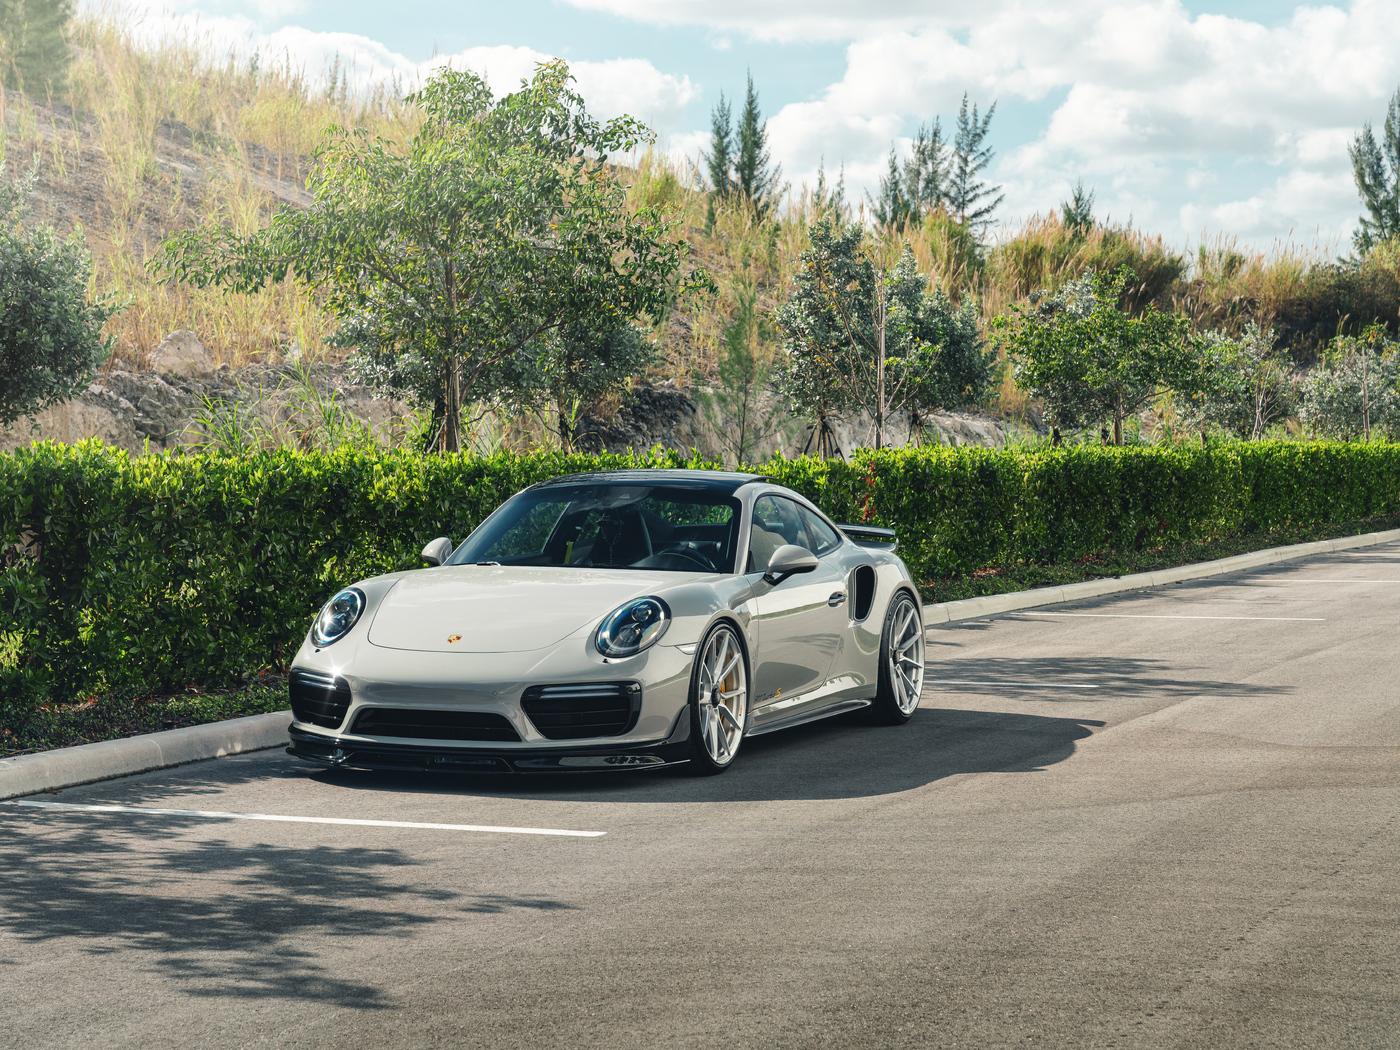 porsche-911-turbo-s-8k-az.jpg